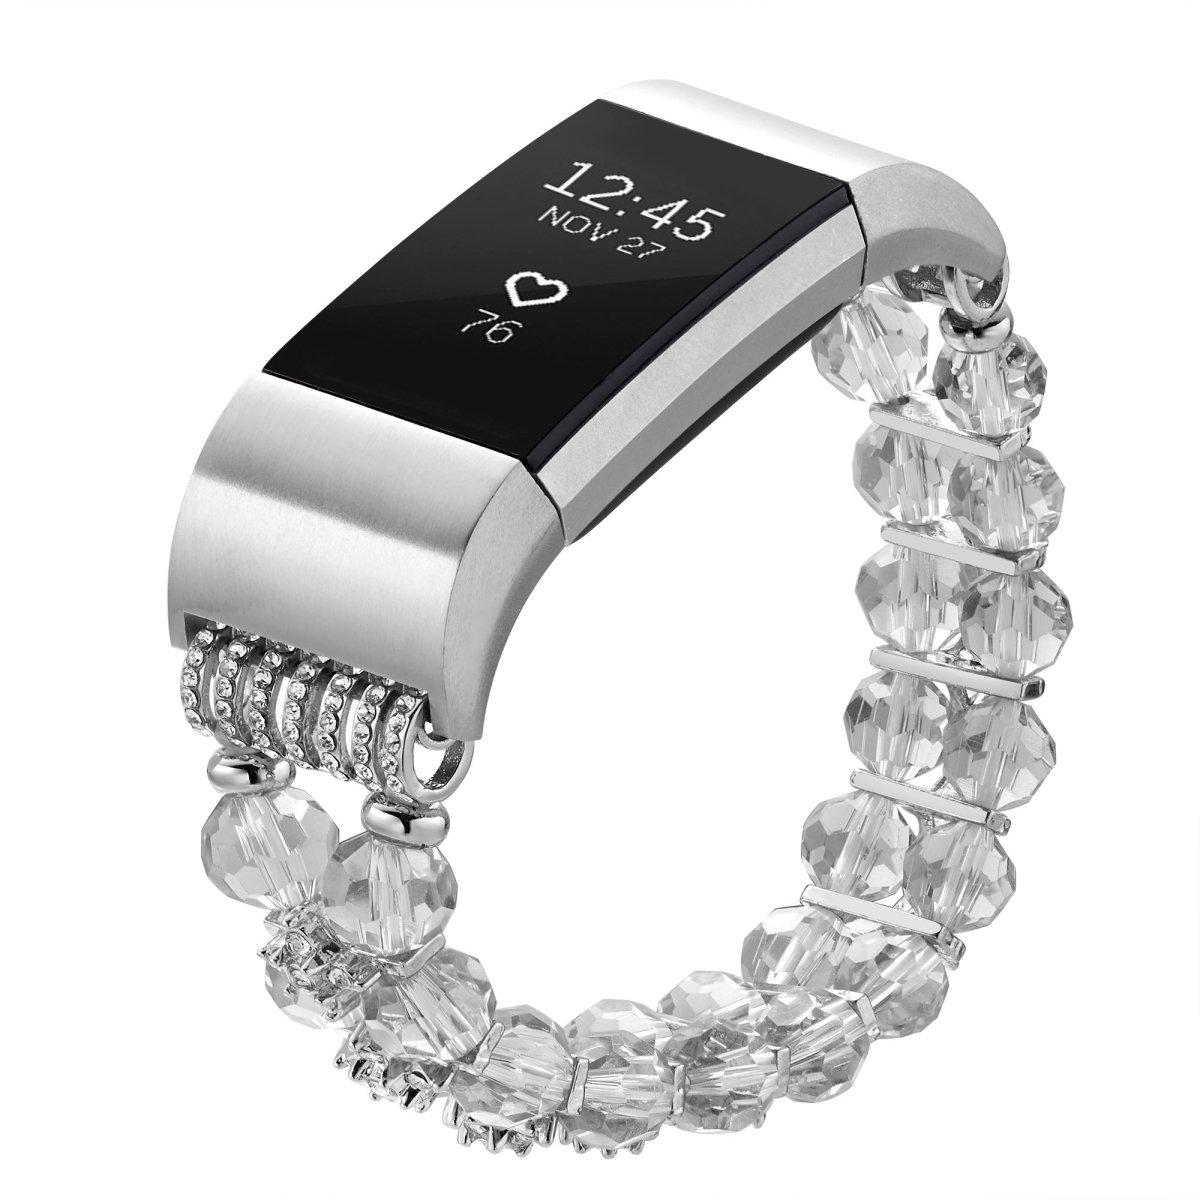 pintaik for Fitbit Charge 2バンドの女性、2018新しいファッションクリスタルパールビーズゴムブレスレットLady Girlジュエリーリストバンド B07BQYSGNR 2018 CrystalWhite 2018 CrystalWhite